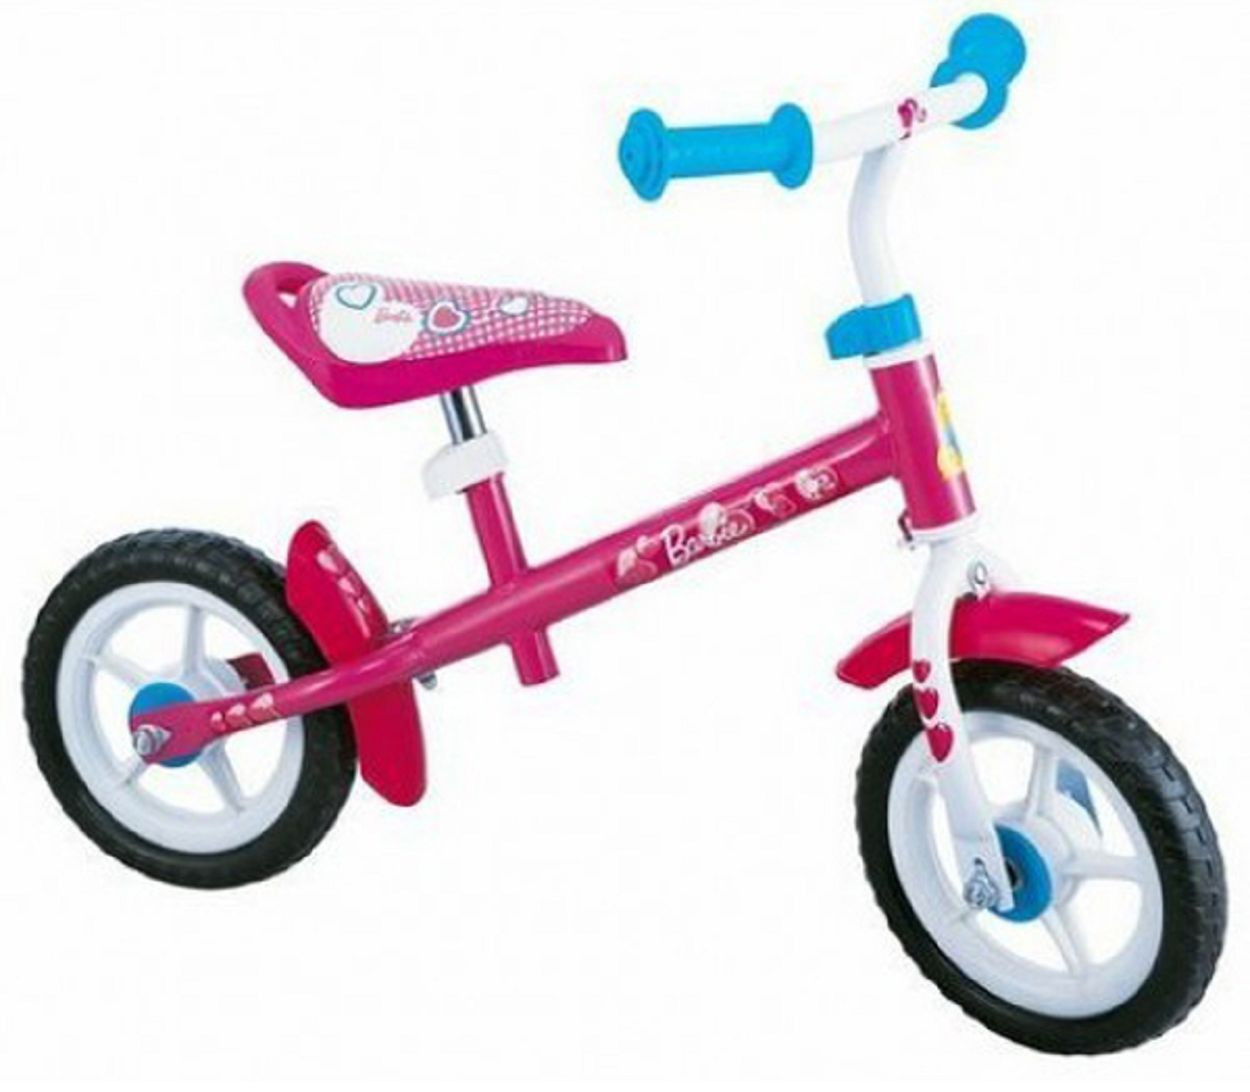 "Беговел STAMP Barbie 10"" pink-white - 14554 - BGToys в Одессе"